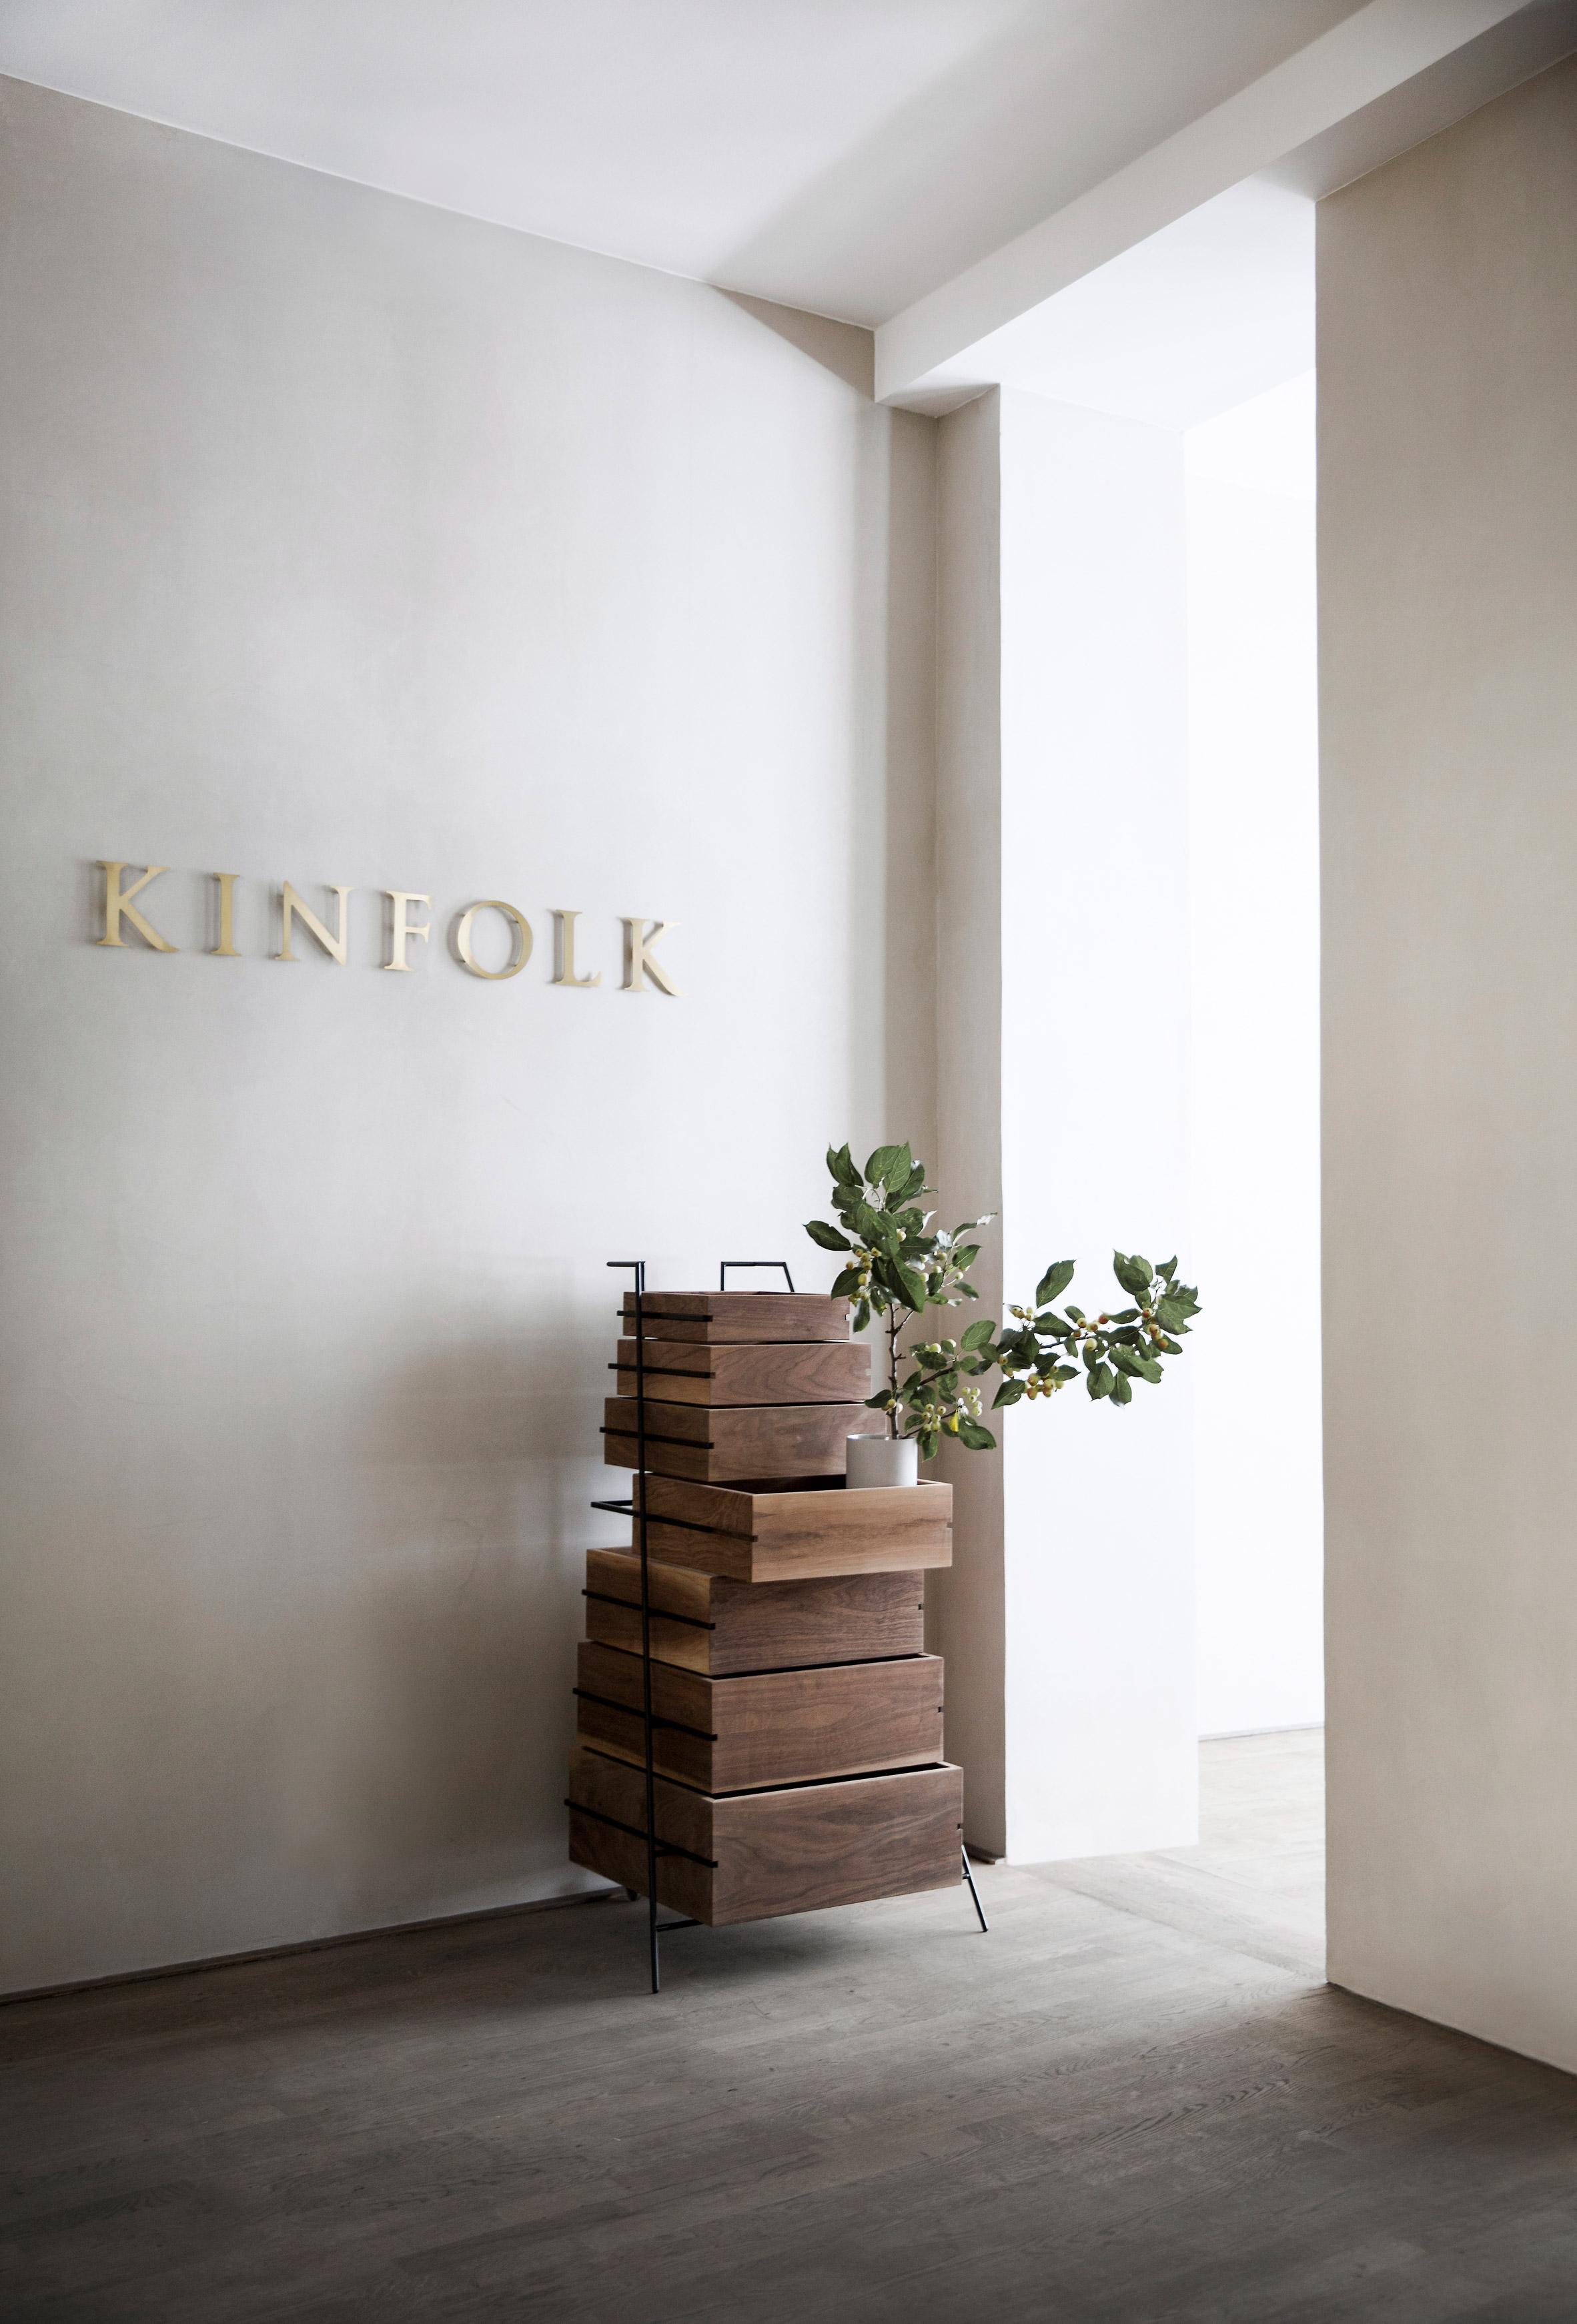 kinfolk-office_norm_architects_interiors_gallery_copenhagen_dezeen_2364_col_9.jpg